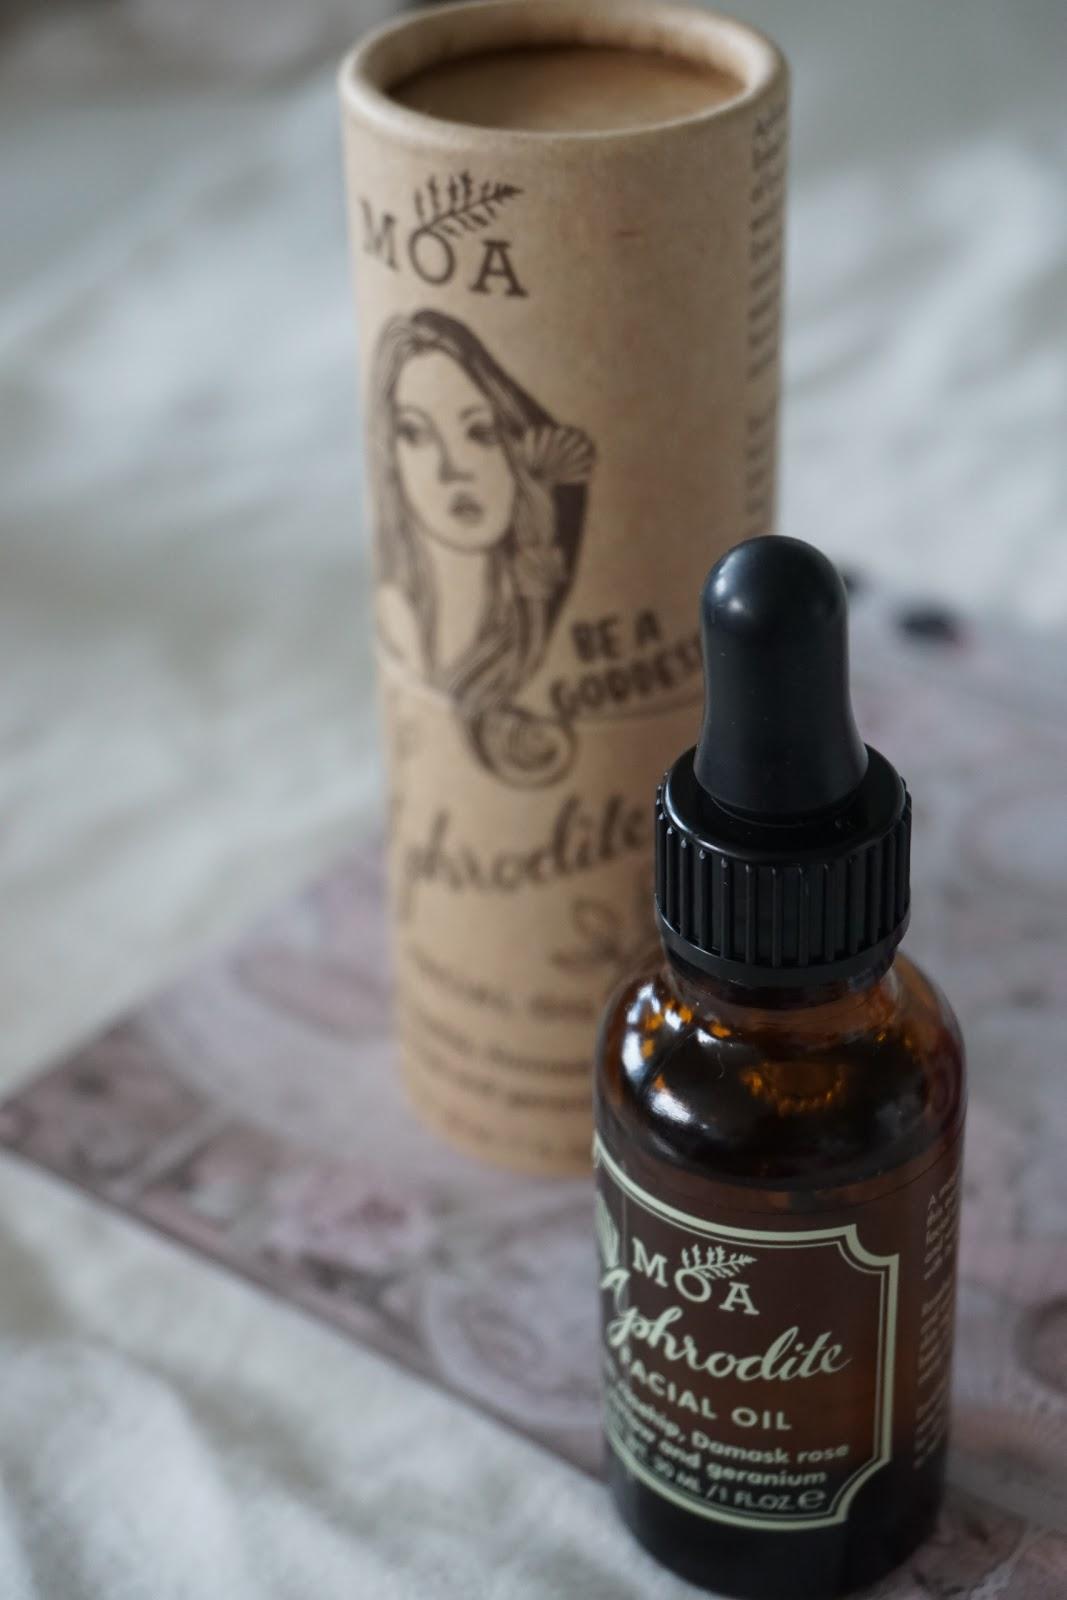 MOA Magic Organic Apothecary Aphrodite Facial Oil kasvoöljy